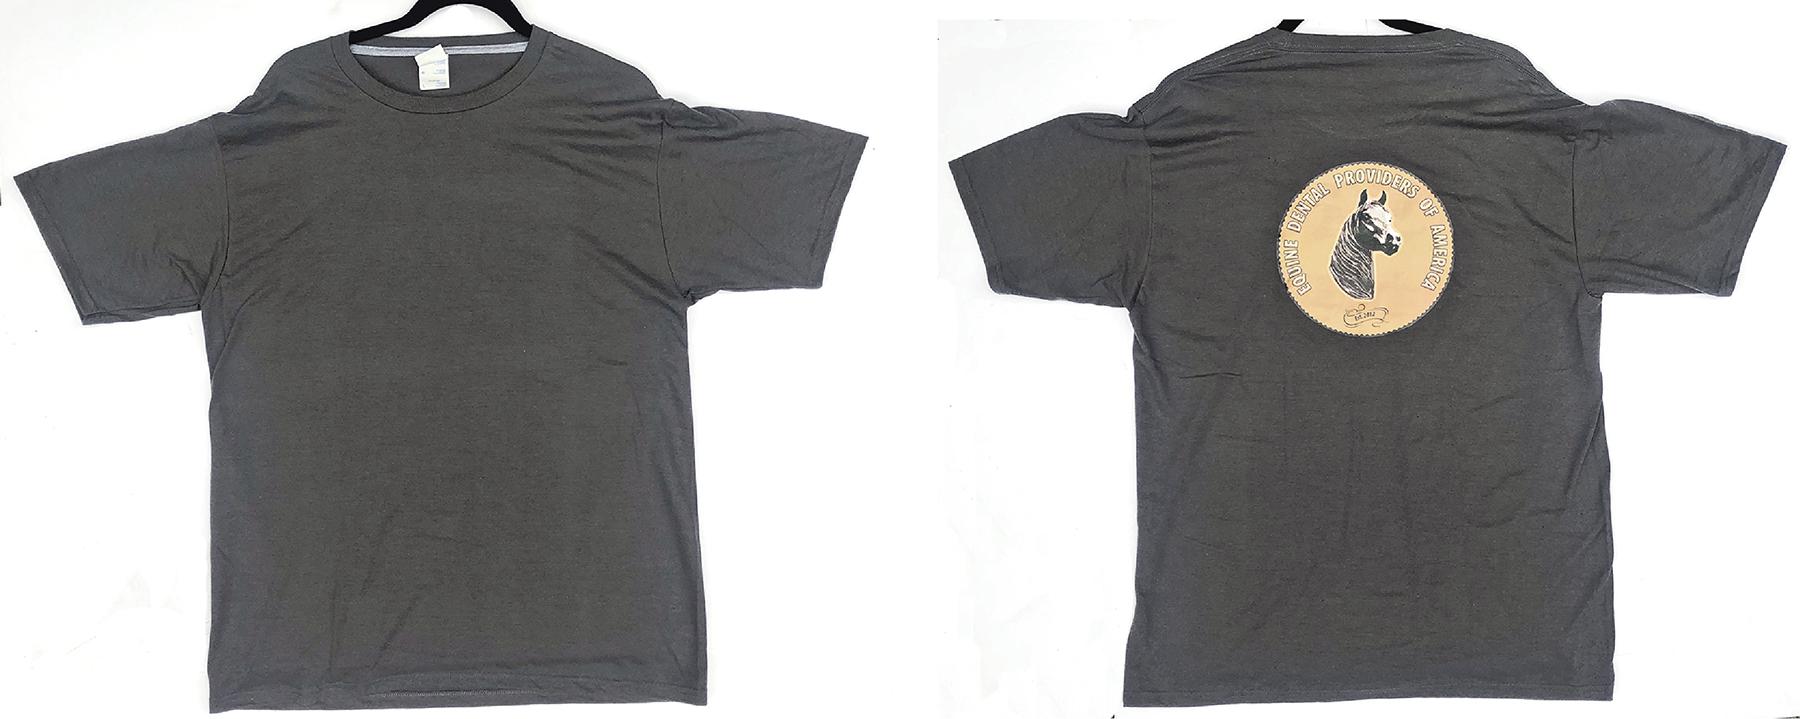 Mens Dark Gray T shirt